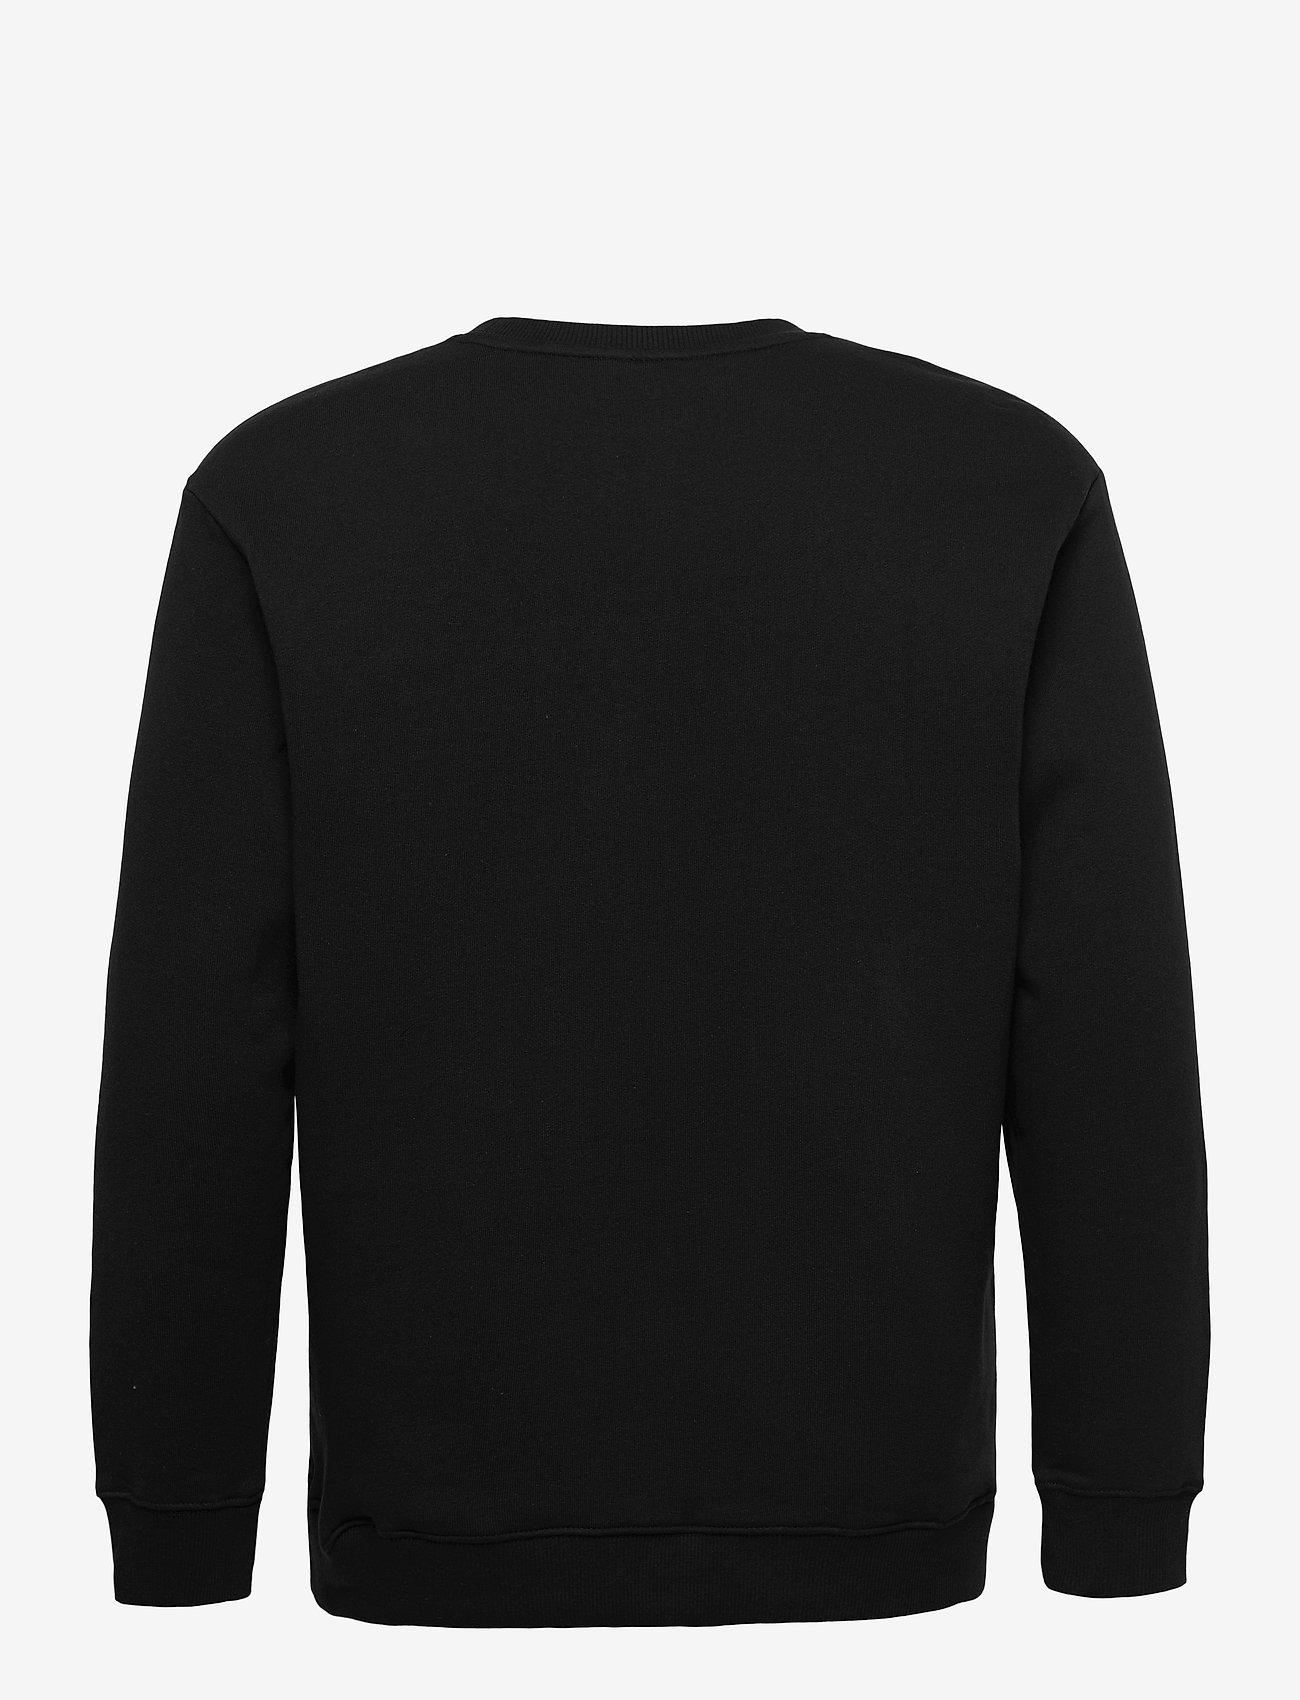 Lee Jeans - BASIC CREW LOGO SWS - tops - black - 1